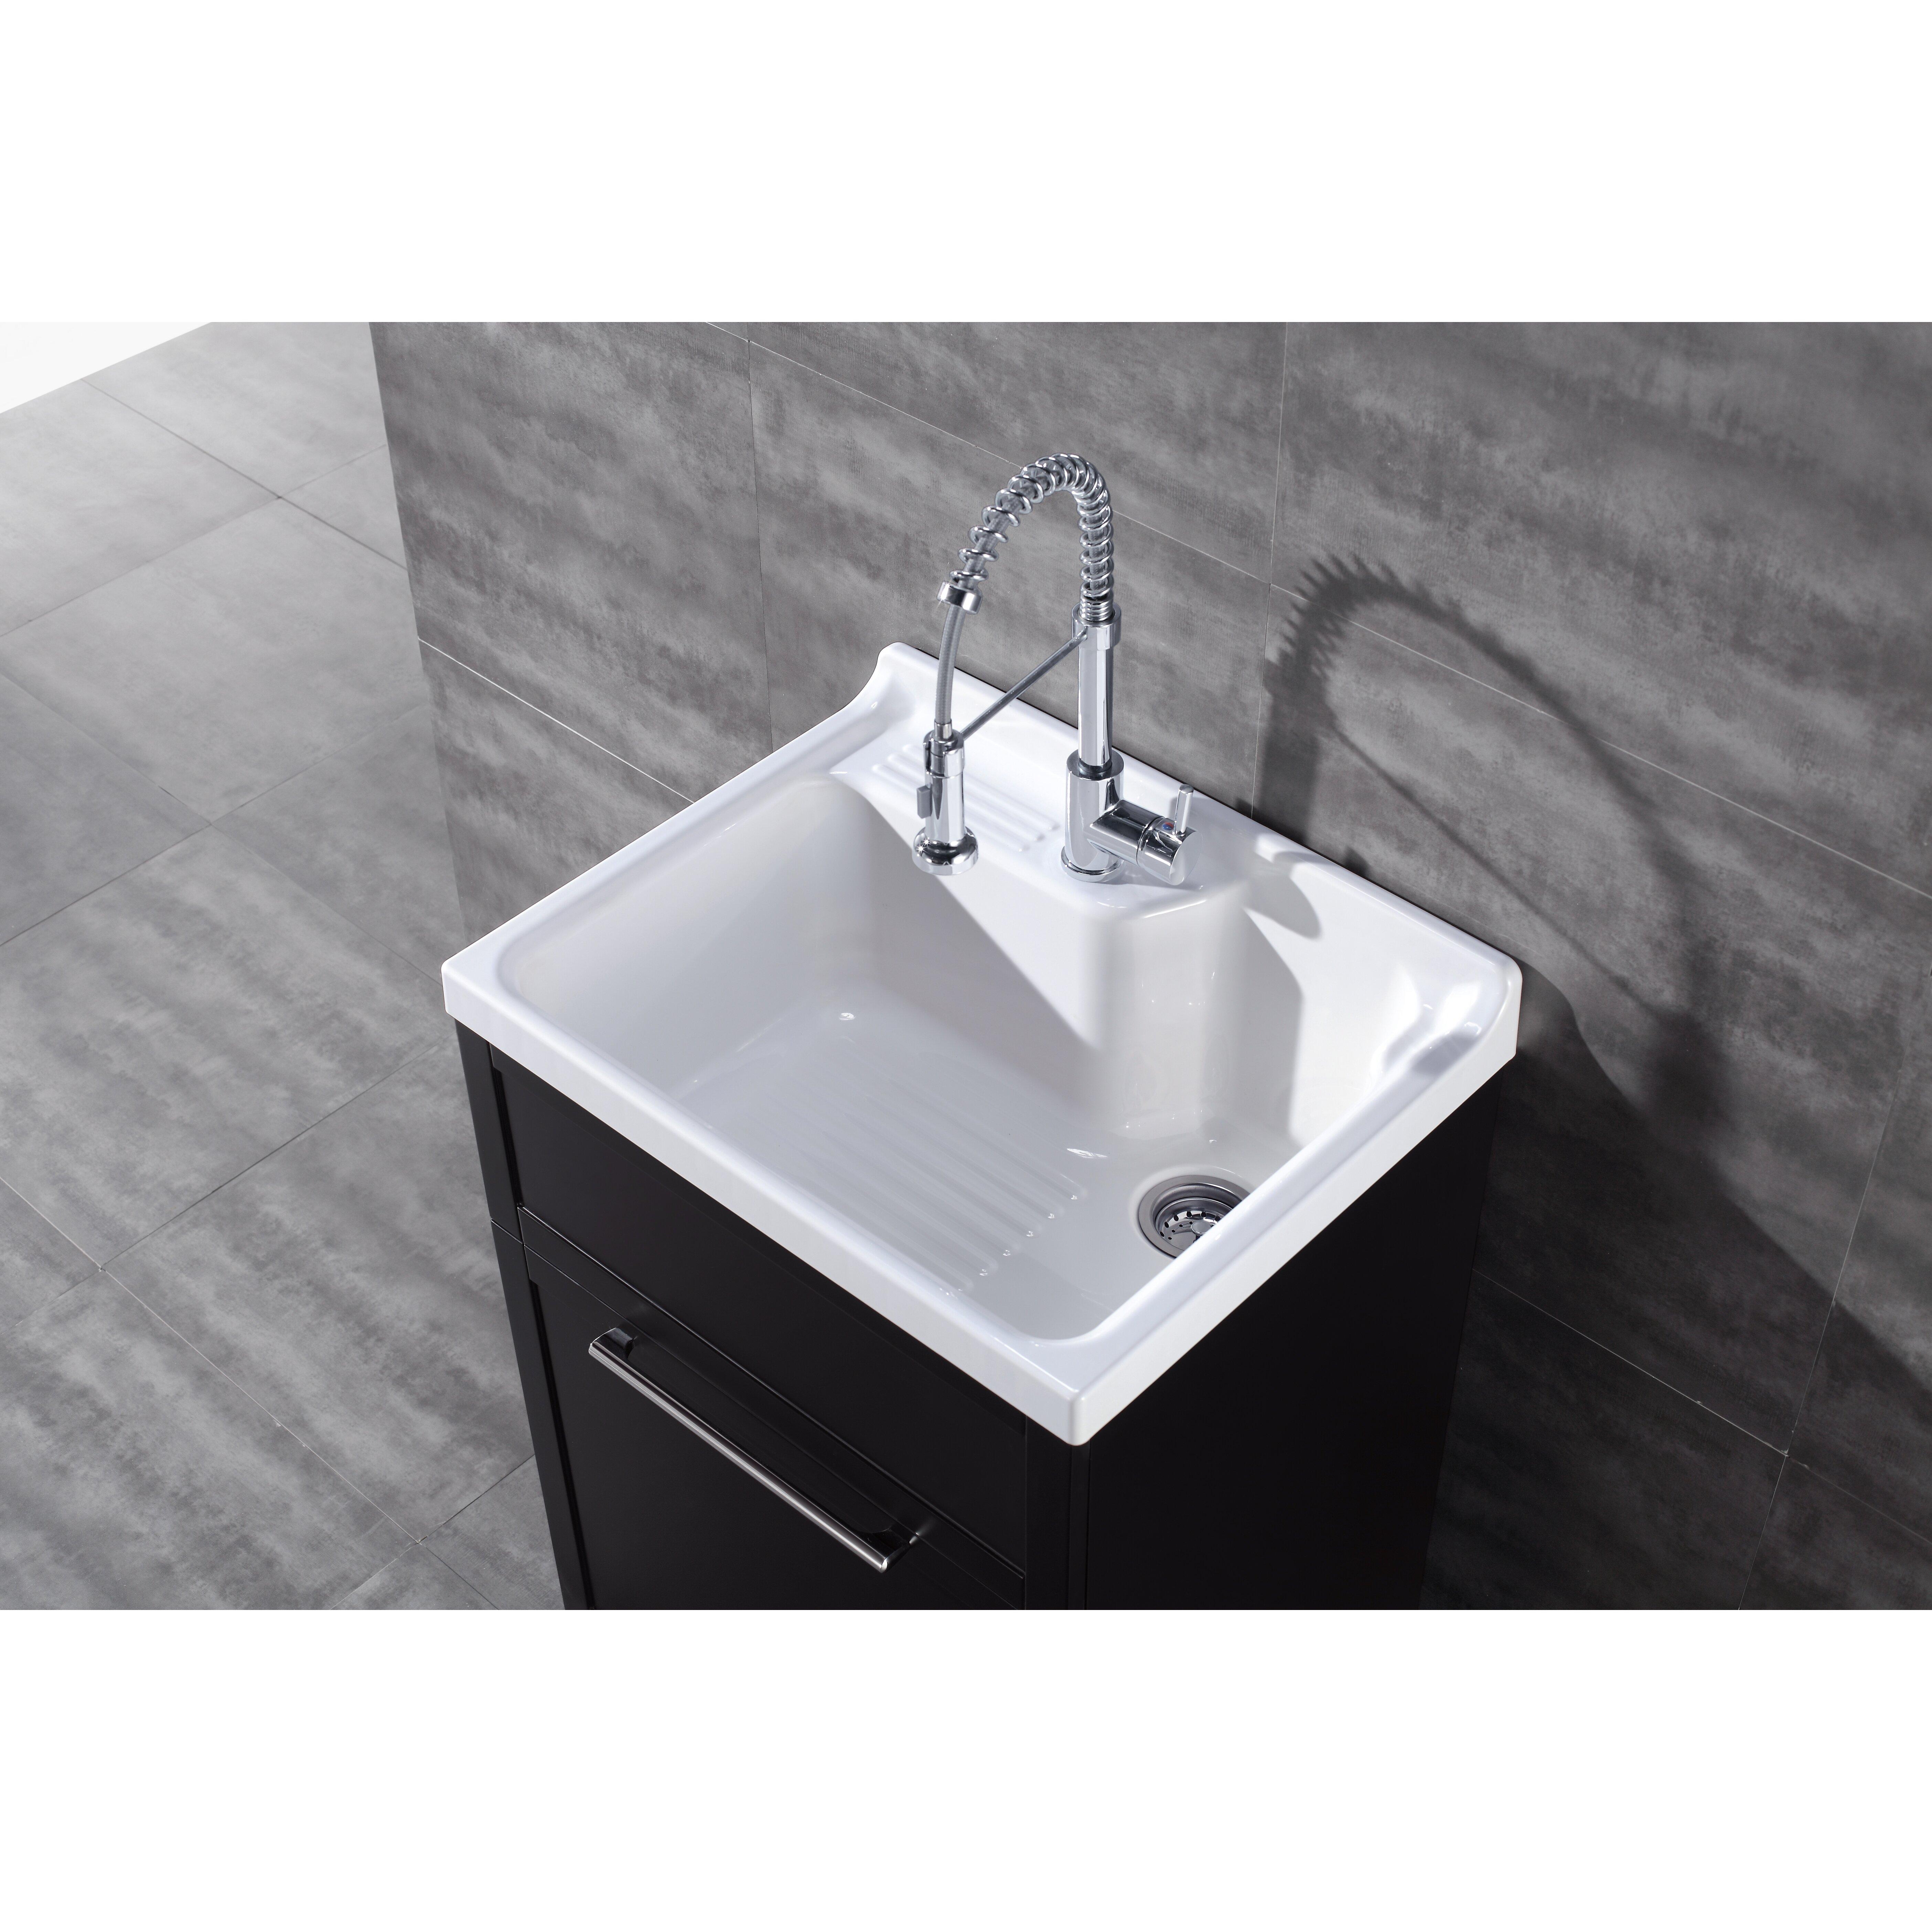 Ove decors utility sink